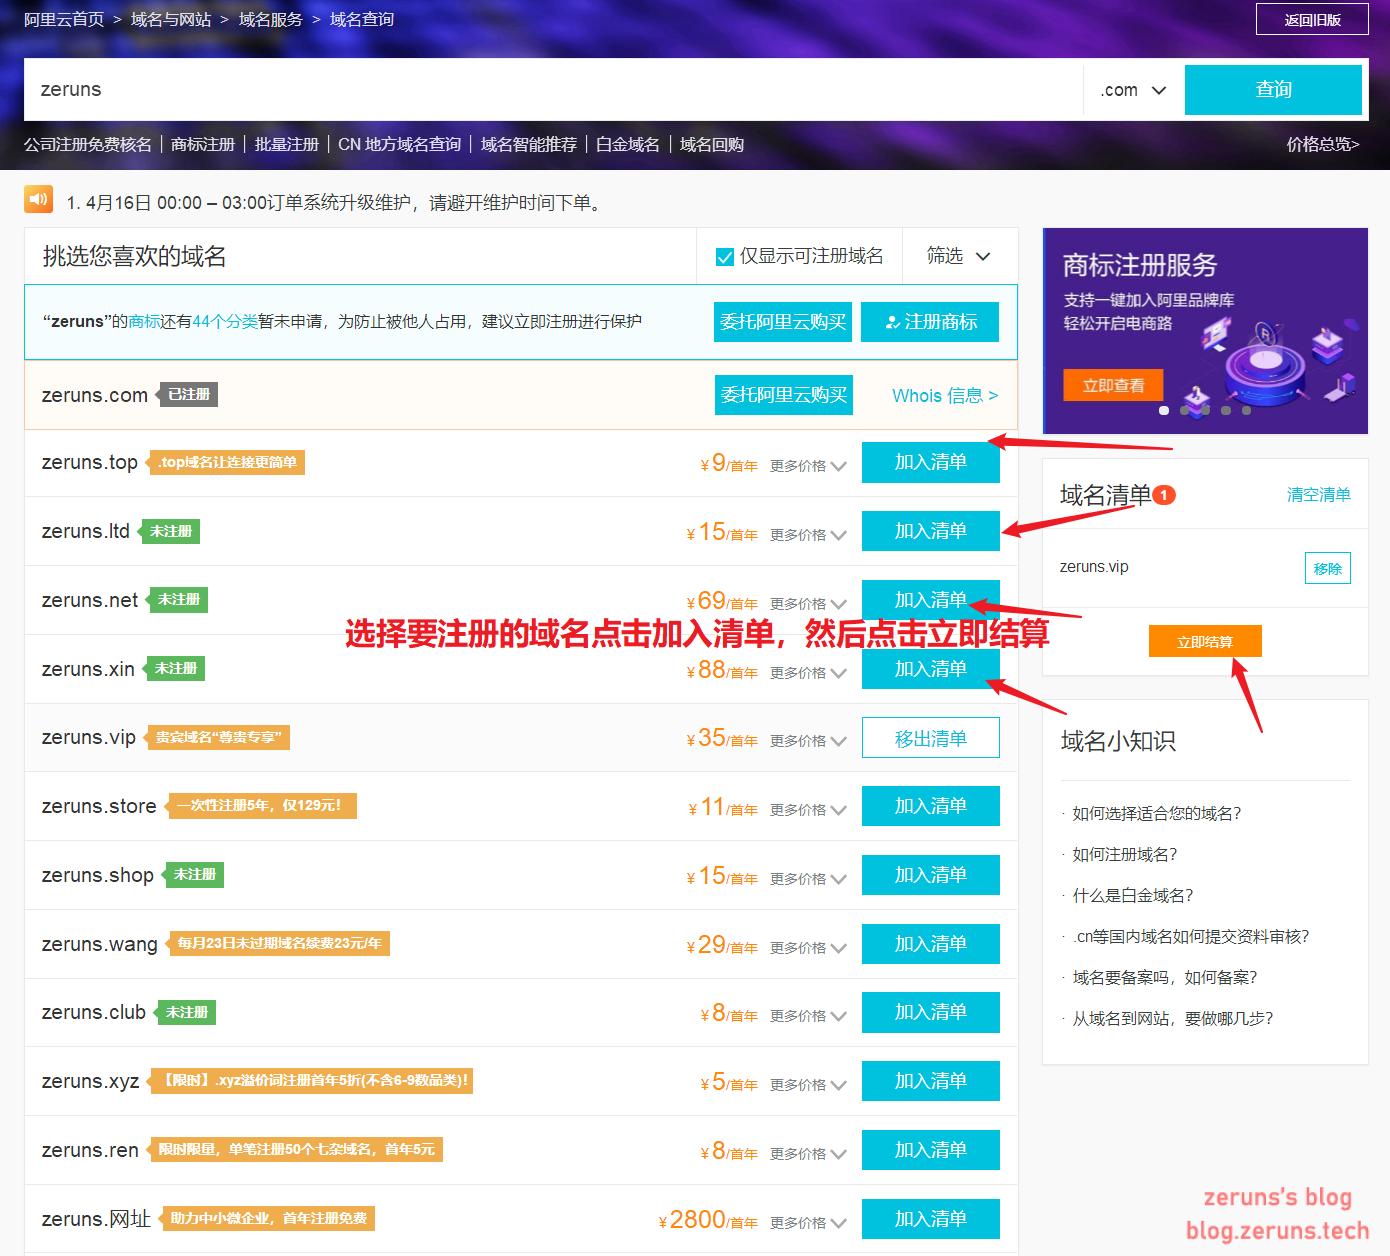 2020 04 17 16 56 12ccea24a74be8a16c - 使用Cloudreve自建不限速的网盘,支持离线下载